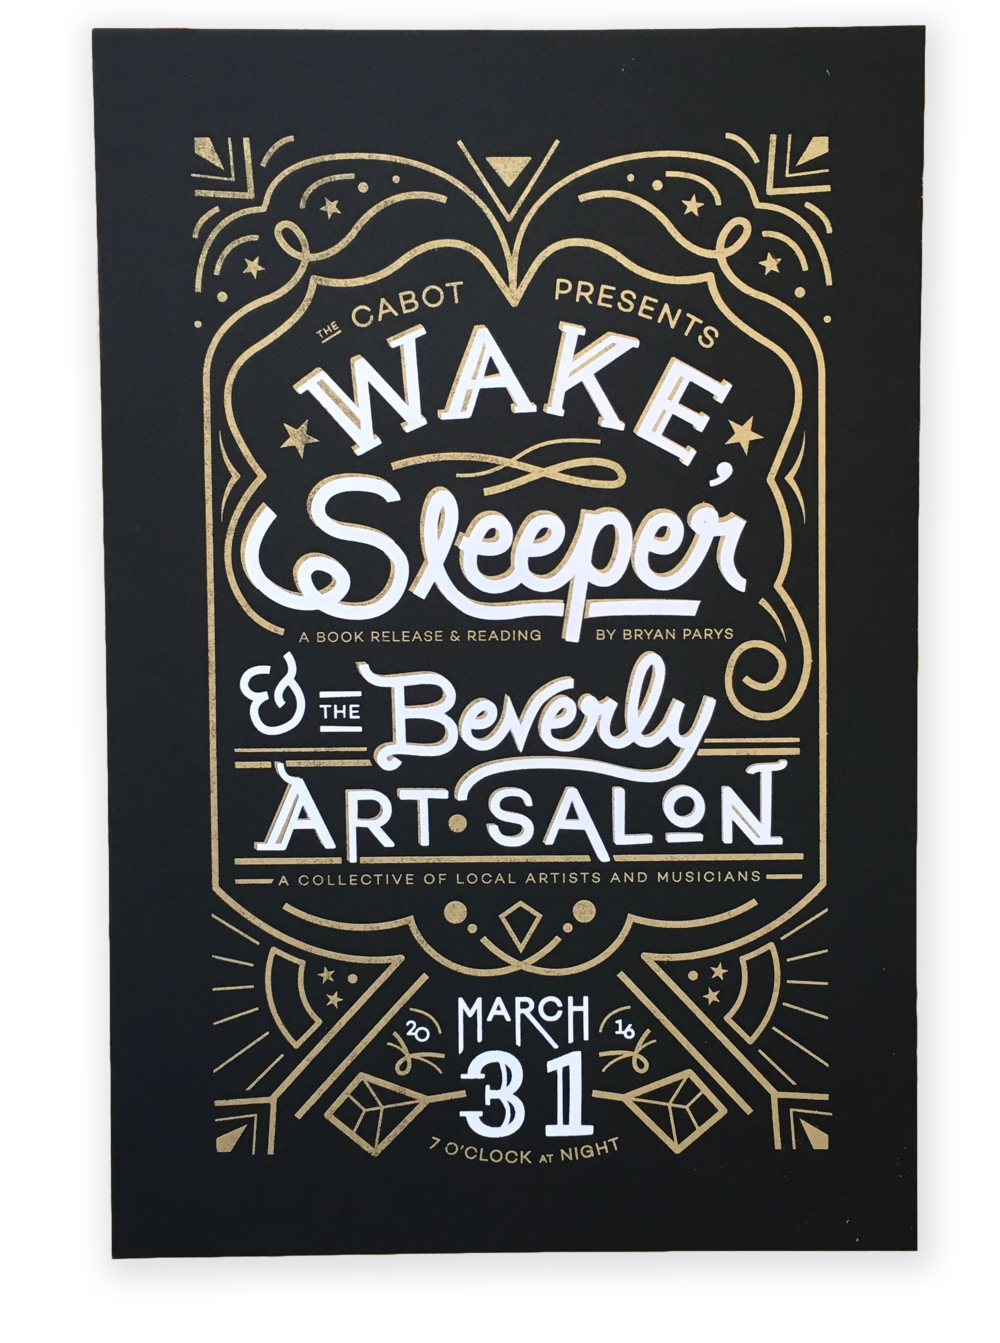 WakeSleeper_black-poster.png